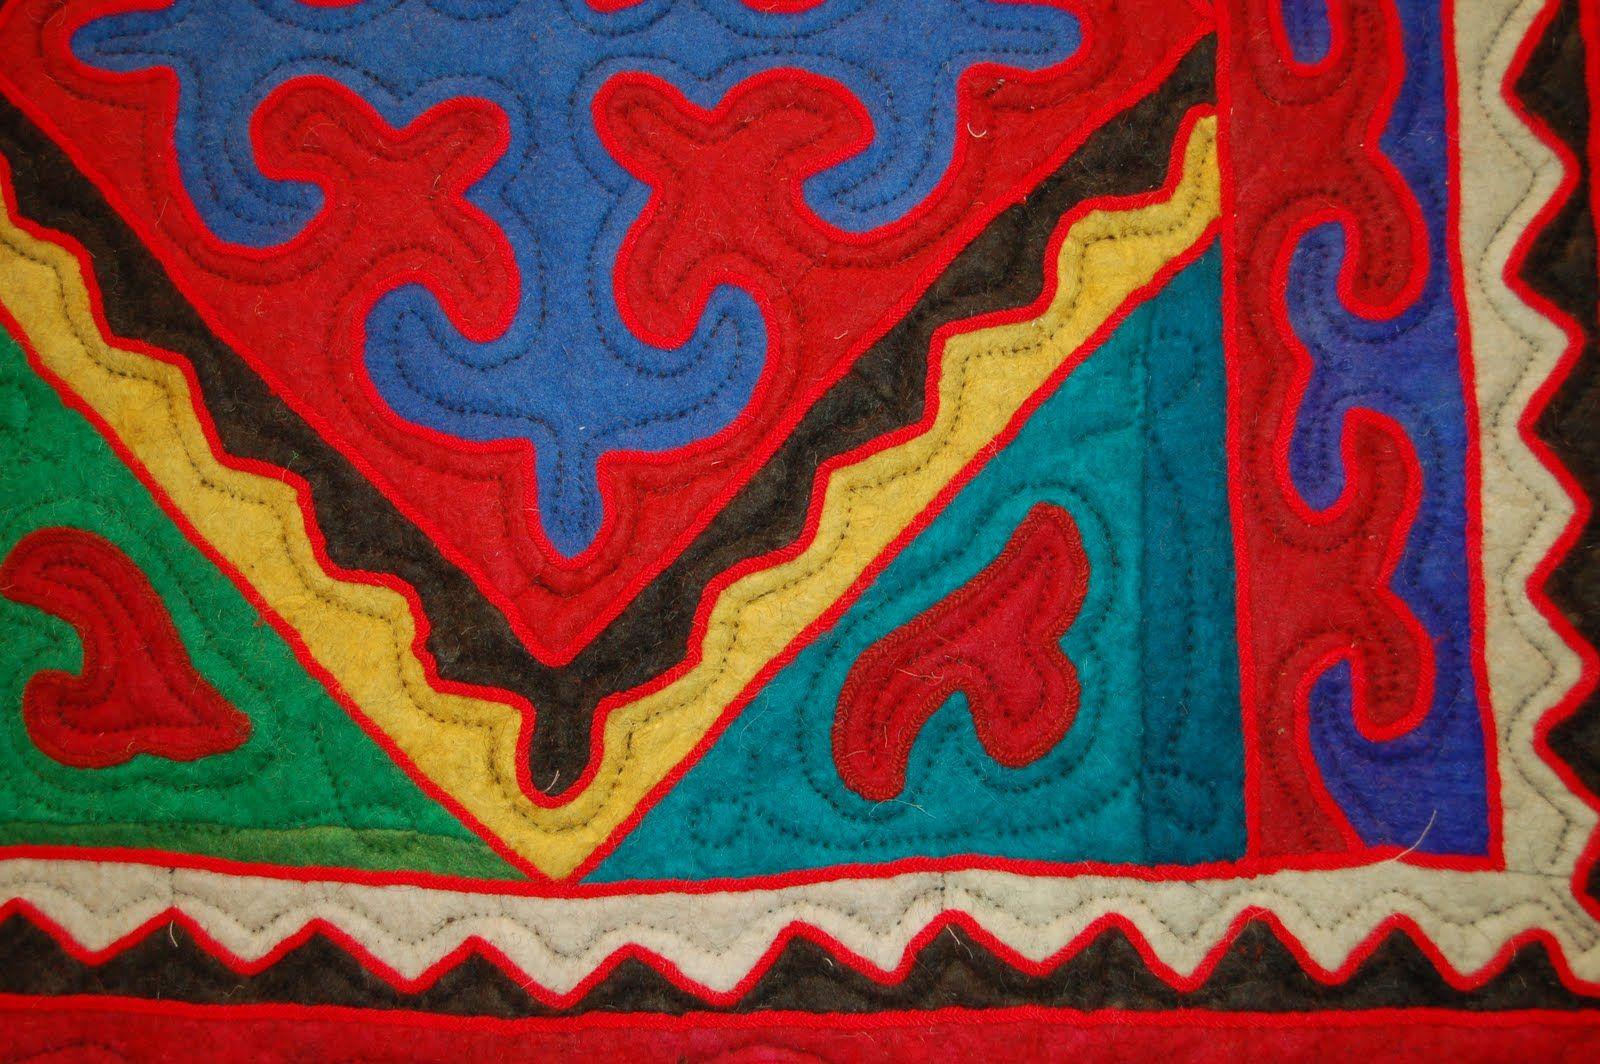 ... rug we stumbled across this beautiful Shyrdak Felt Rug on Unique Rugs